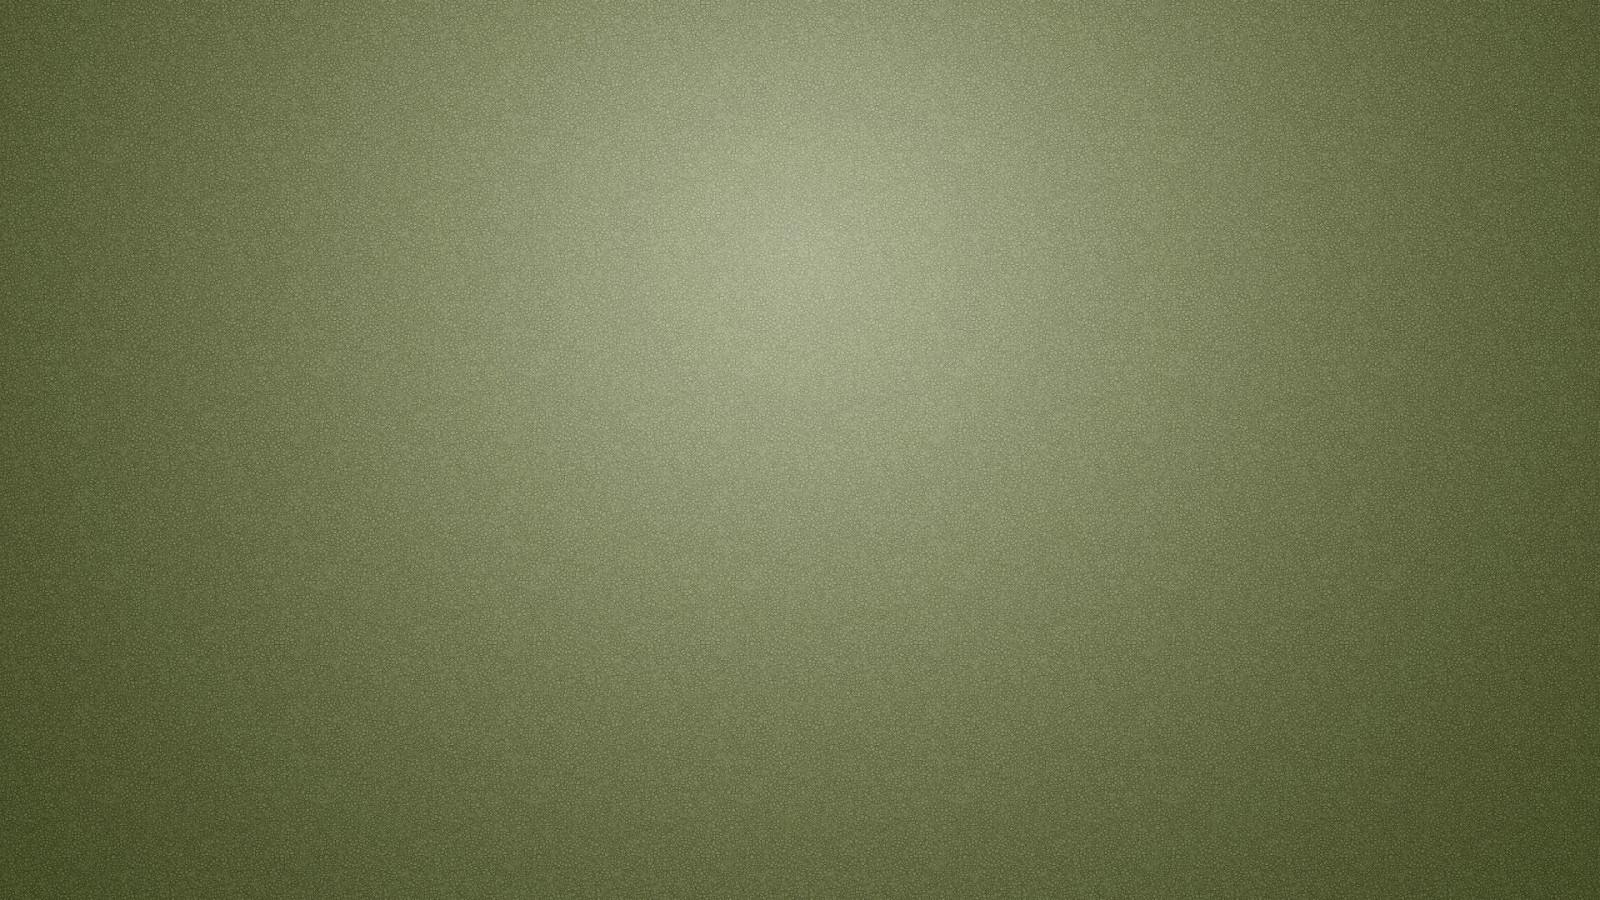 Download 7700 Background Putih Dinding Gratis Terbaru